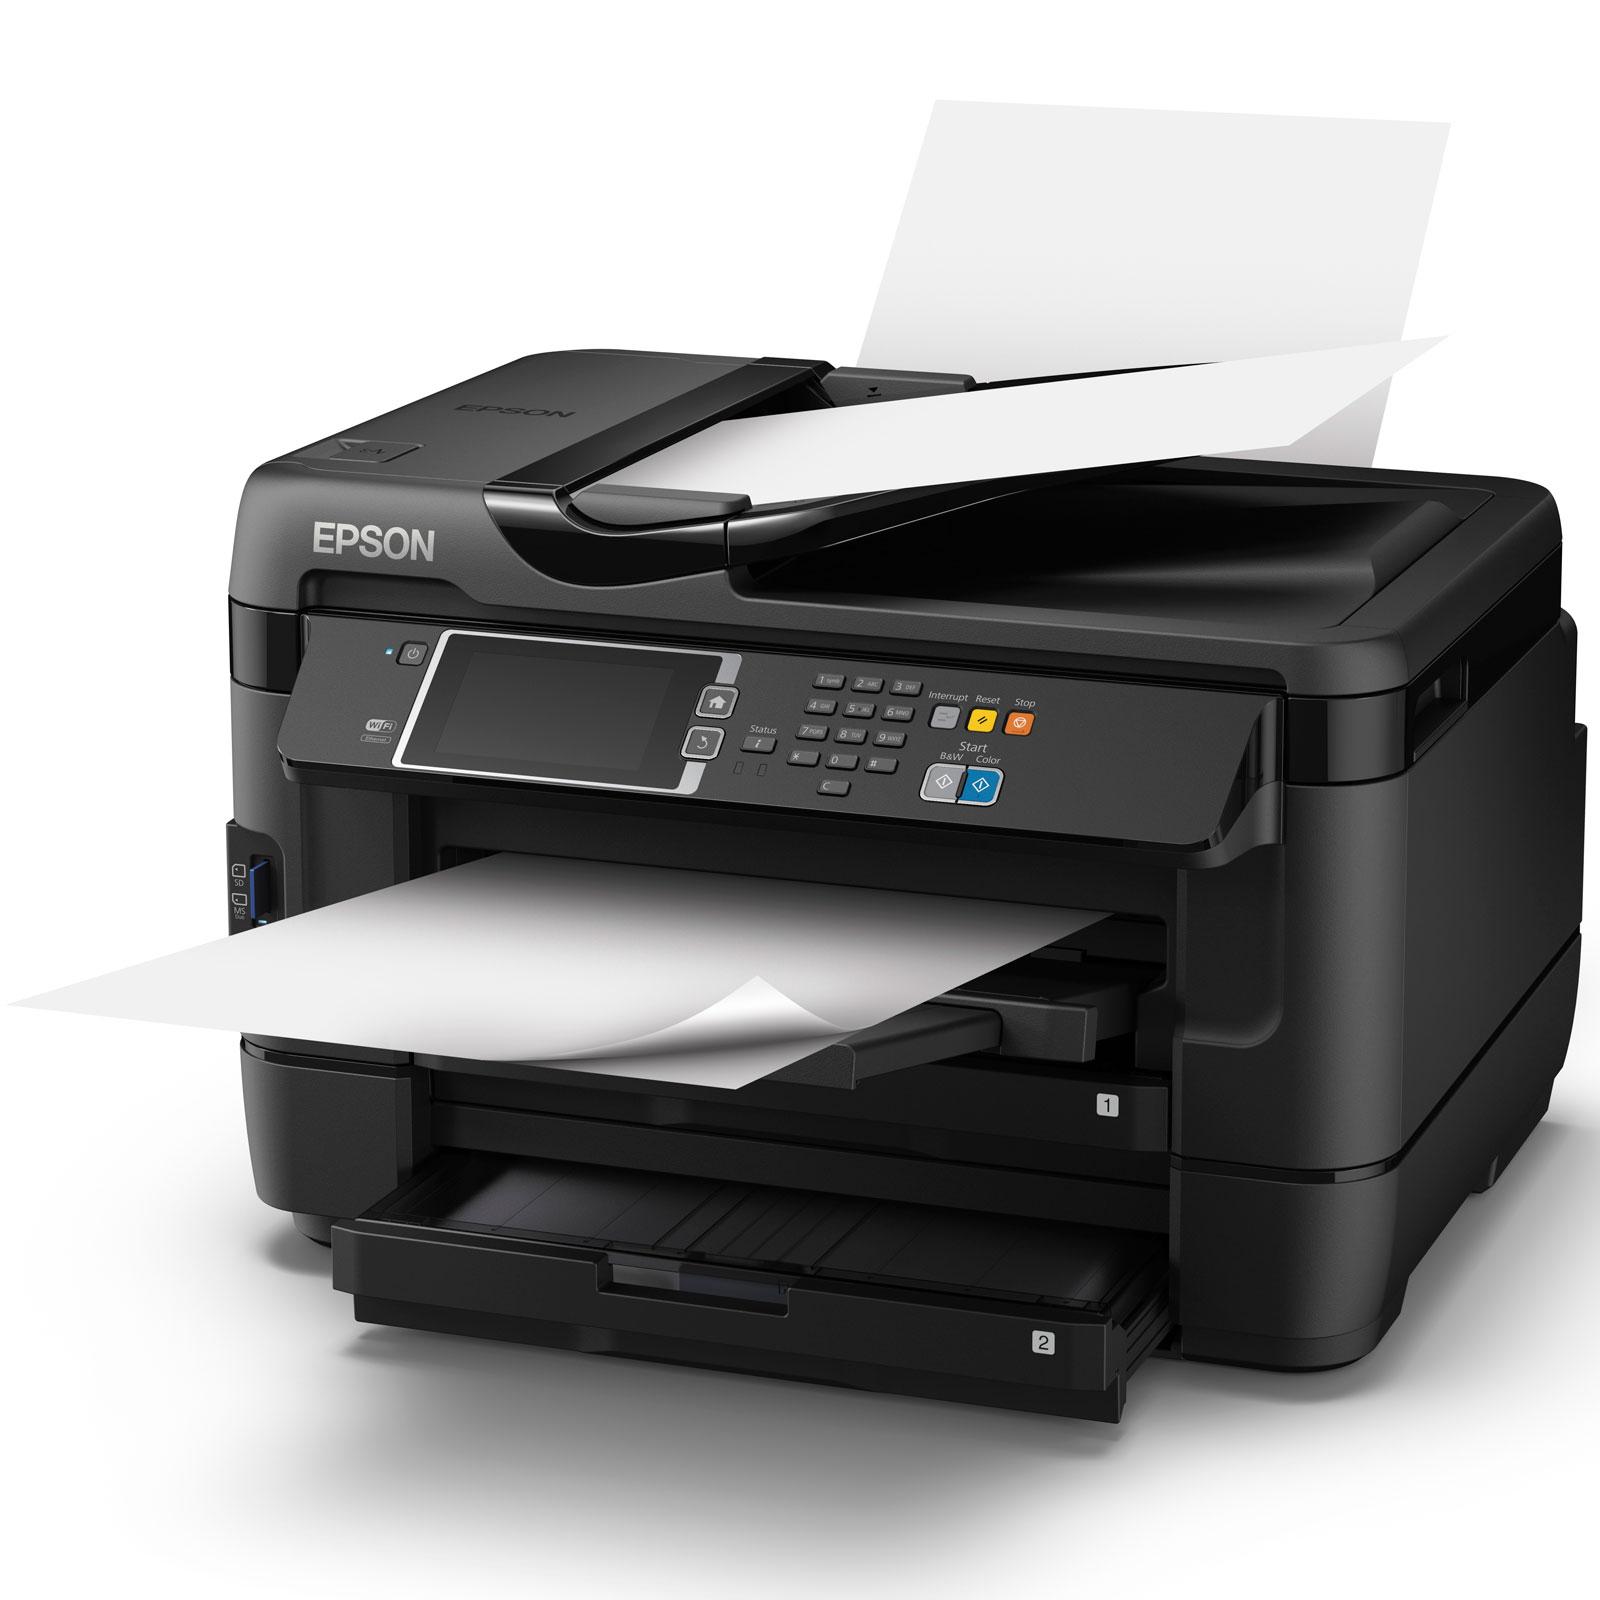 epson workforce wf 7620dtwf imprimante multifonctions jet d 39 encre couleur a3 fax comparer. Black Bedroom Furniture Sets. Home Design Ideas